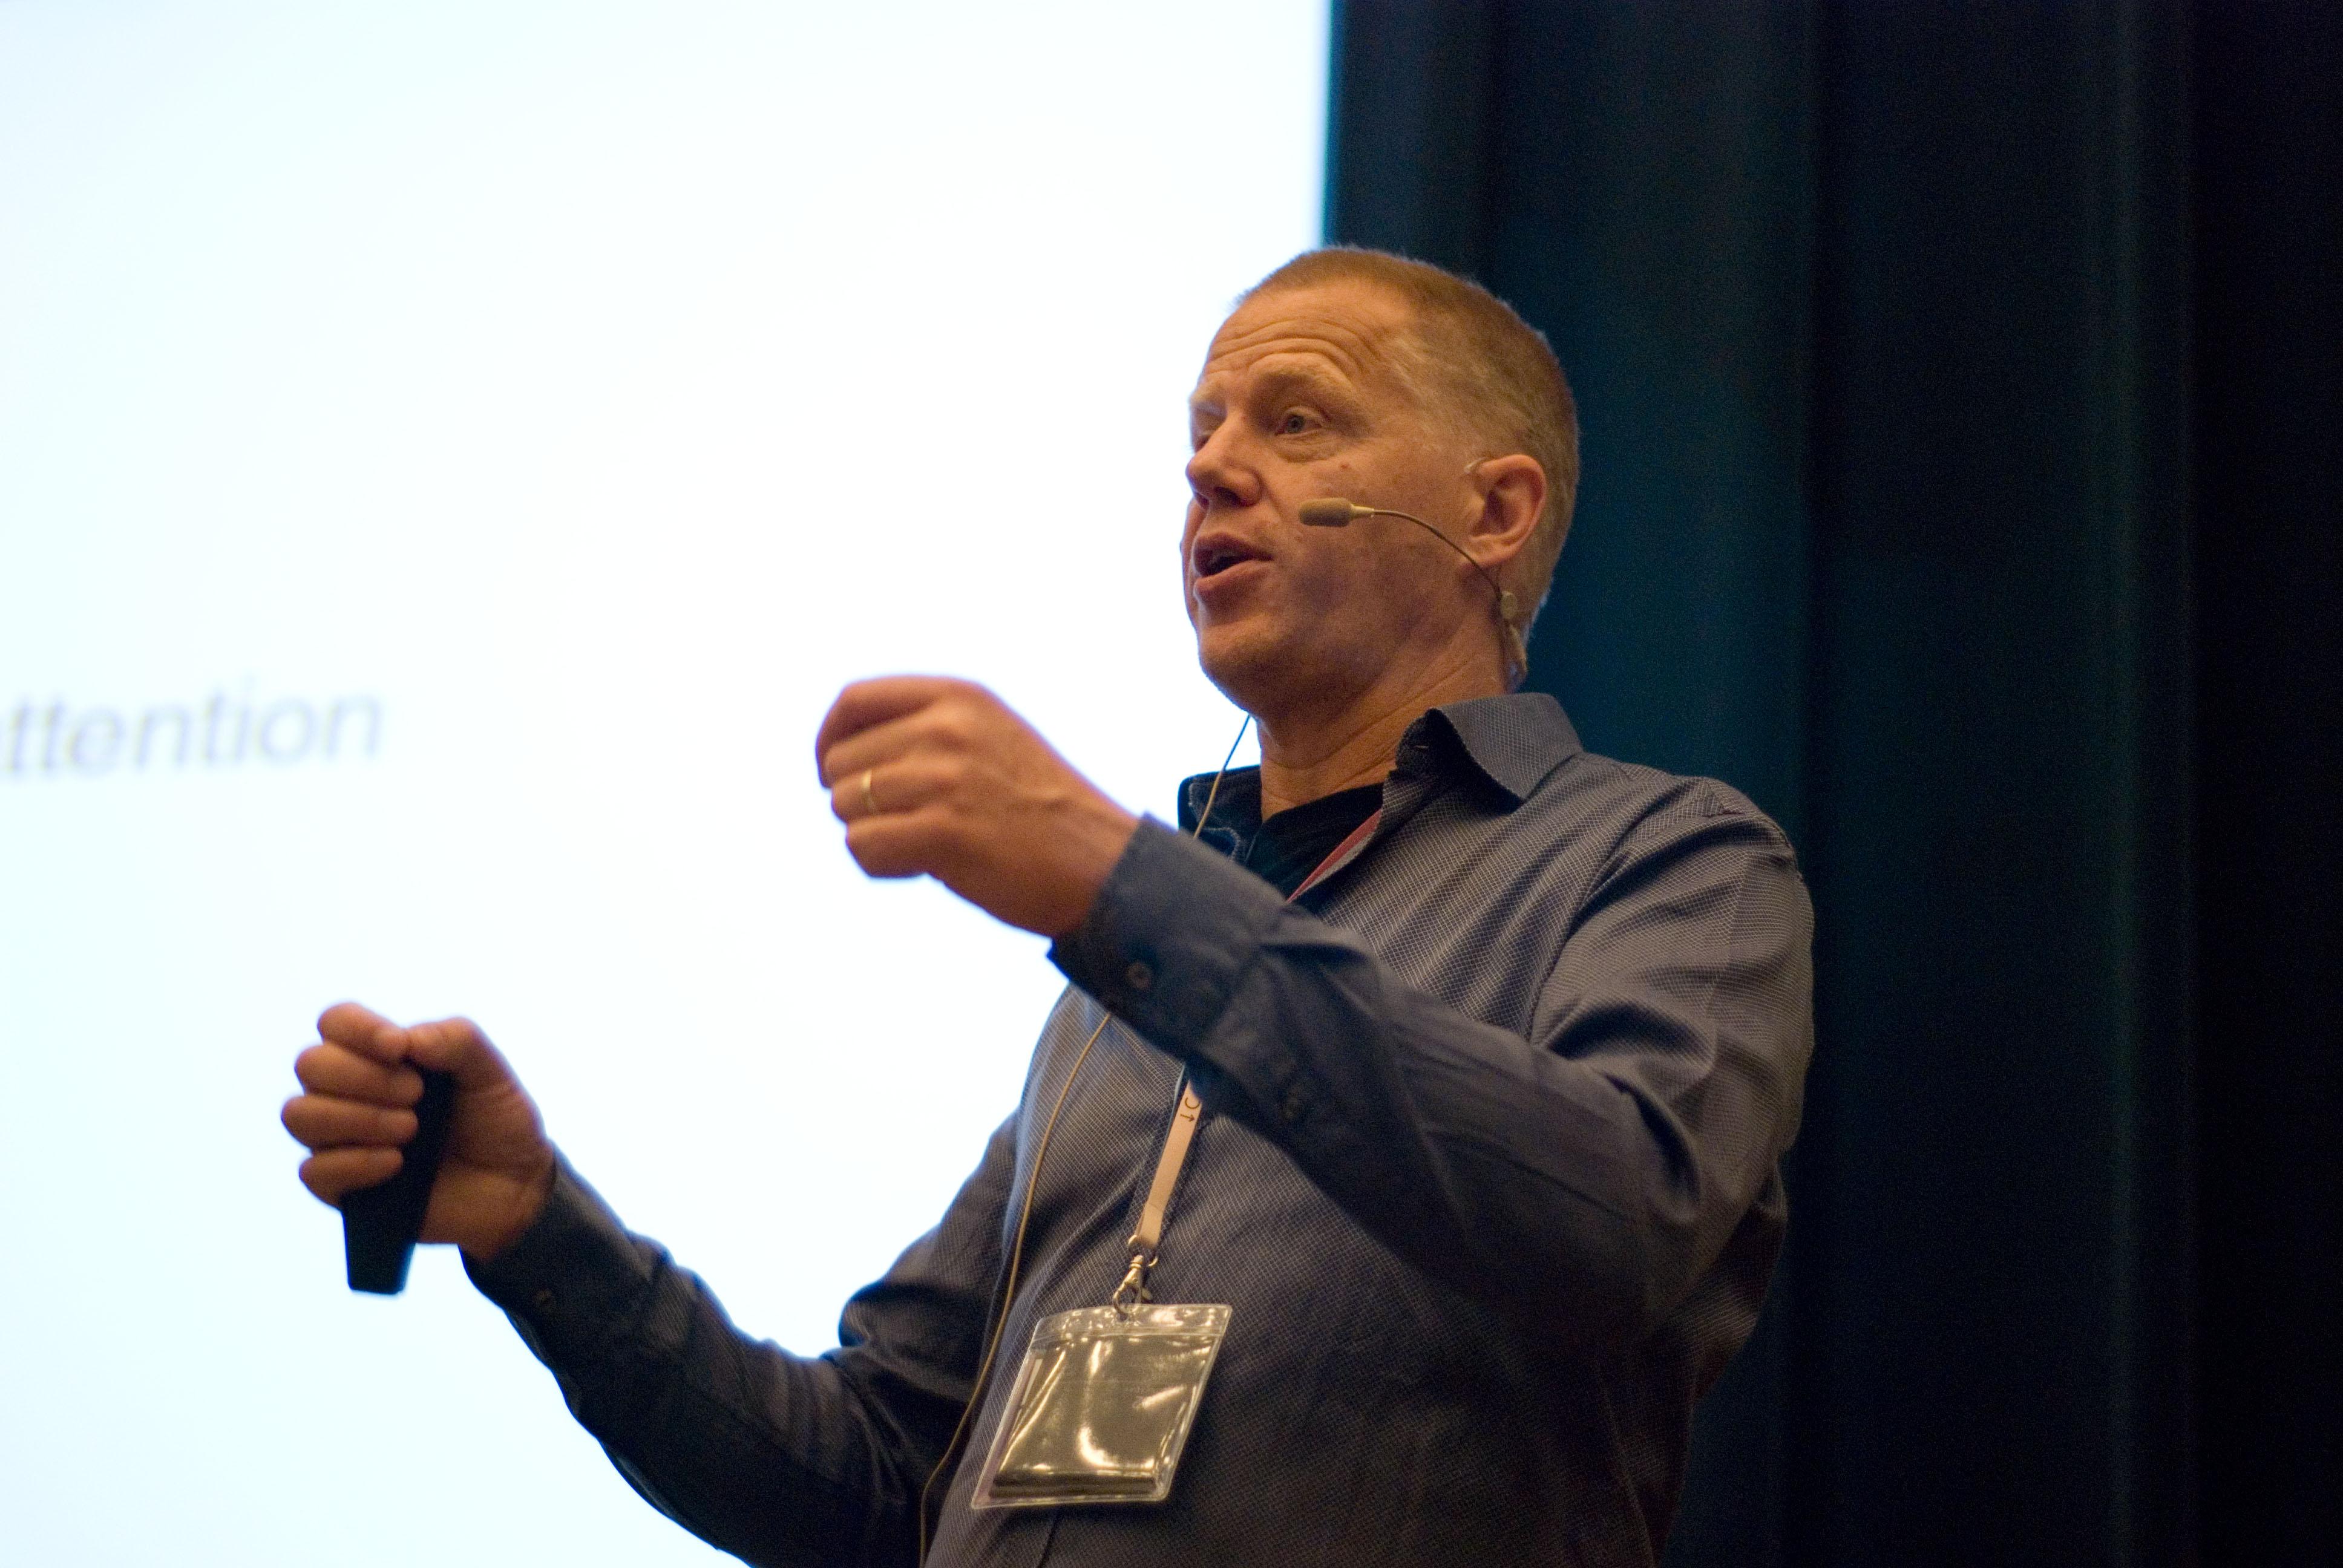 Mikkel Thorup's talk